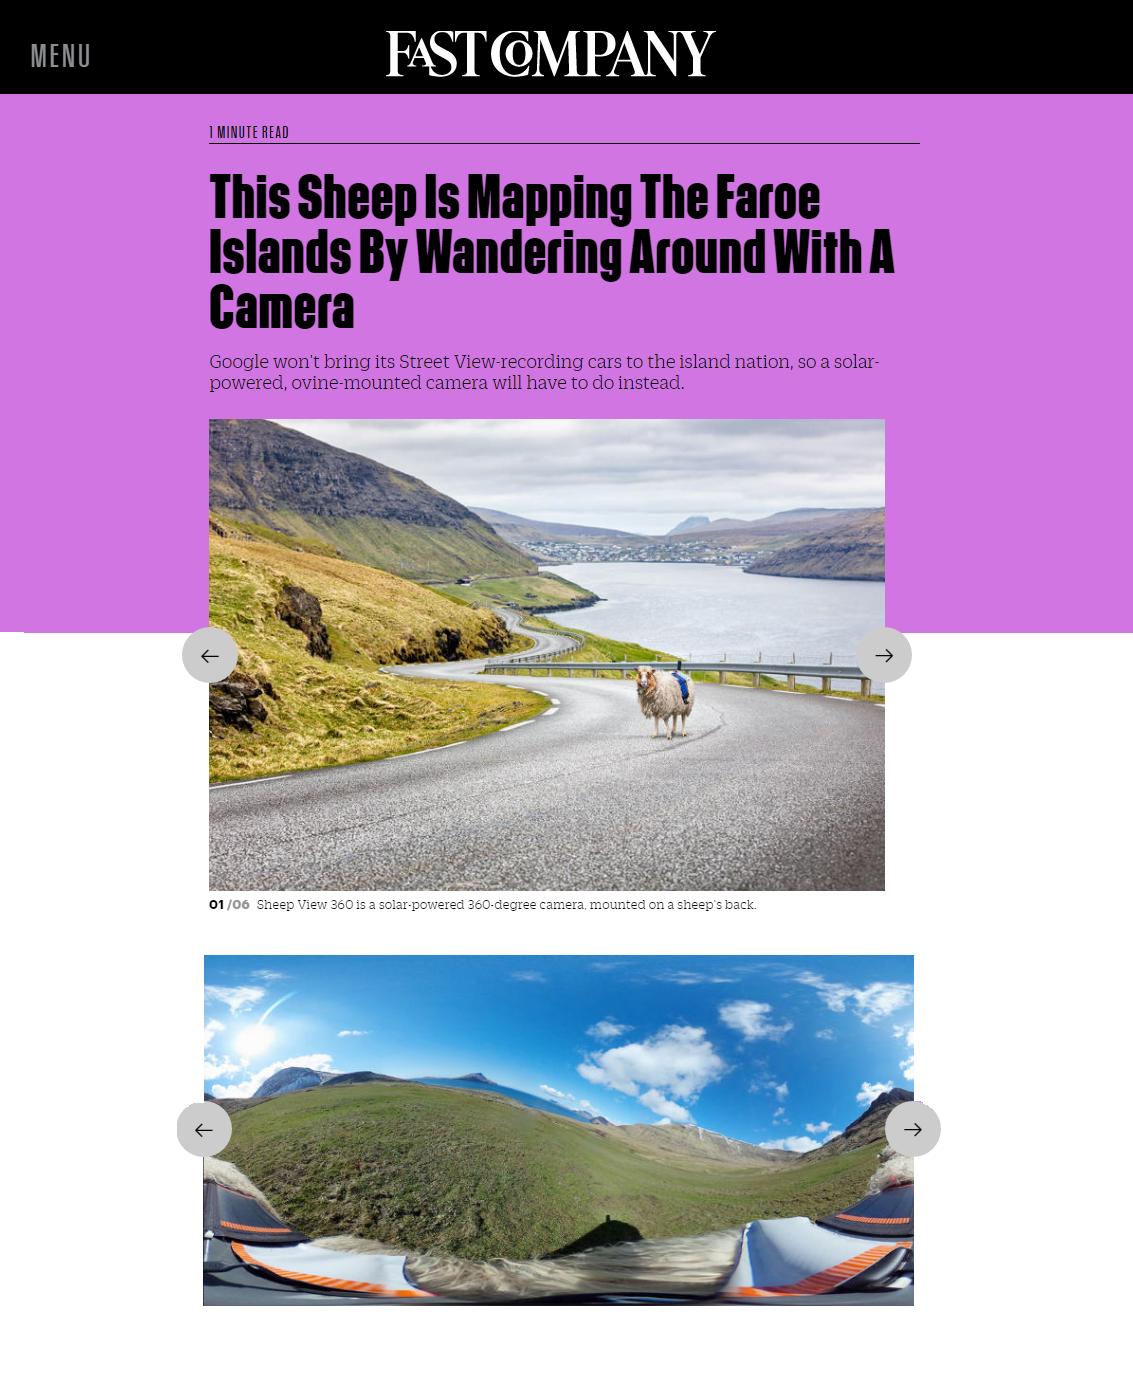 FastCompany Faroe Islands - Page 1.png